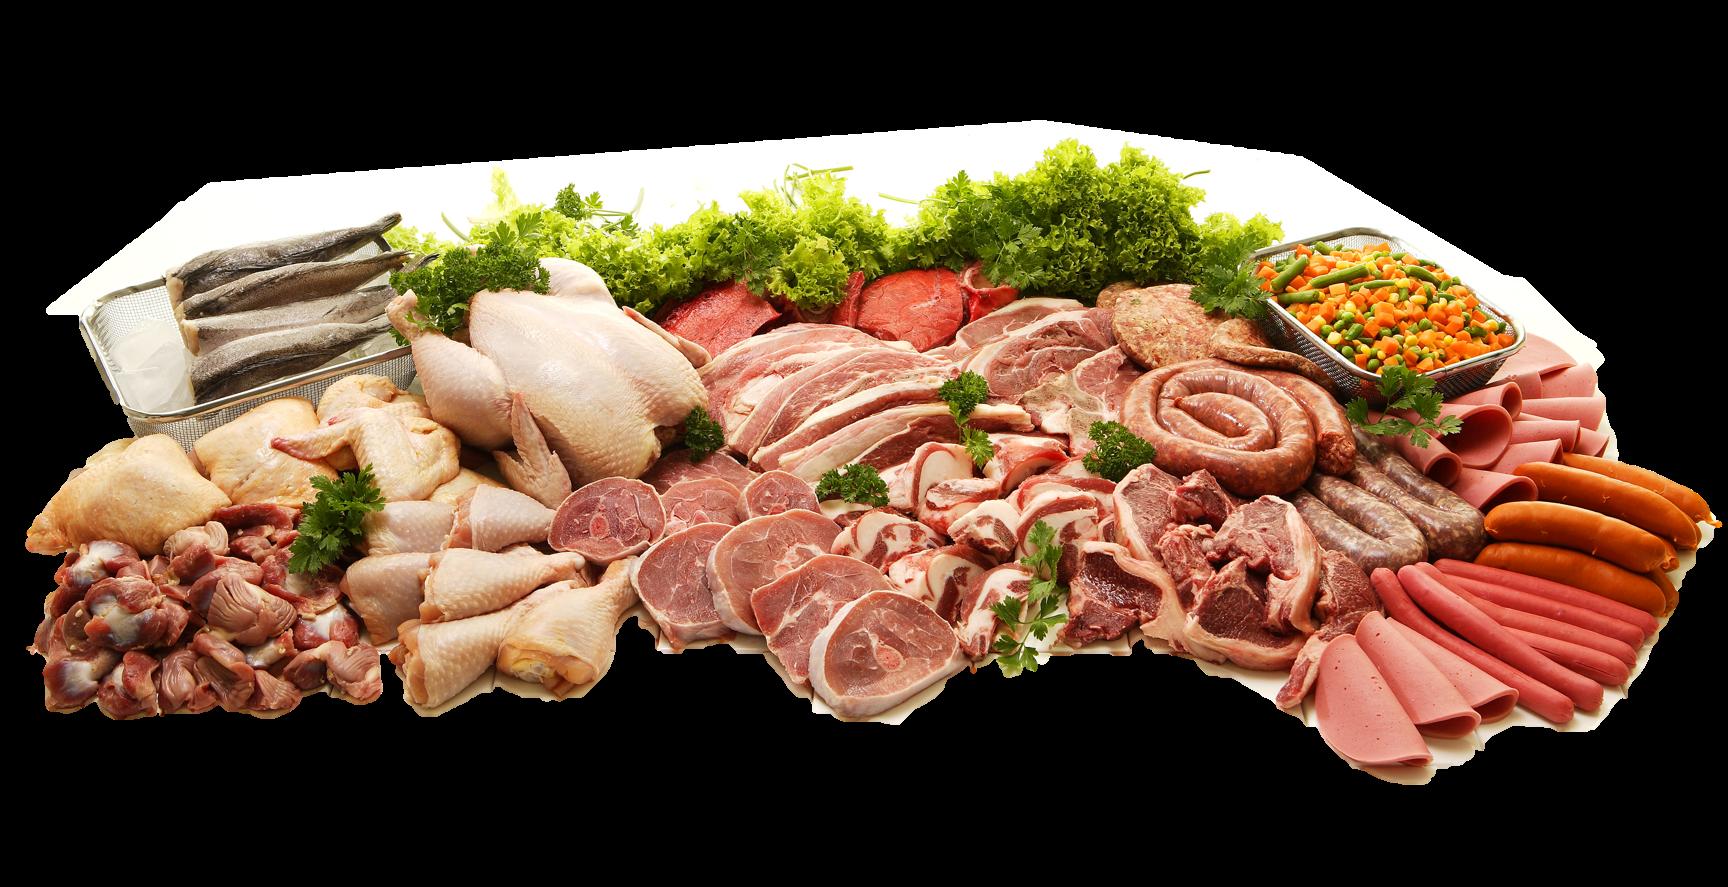 Meat Arrangement Background Removed